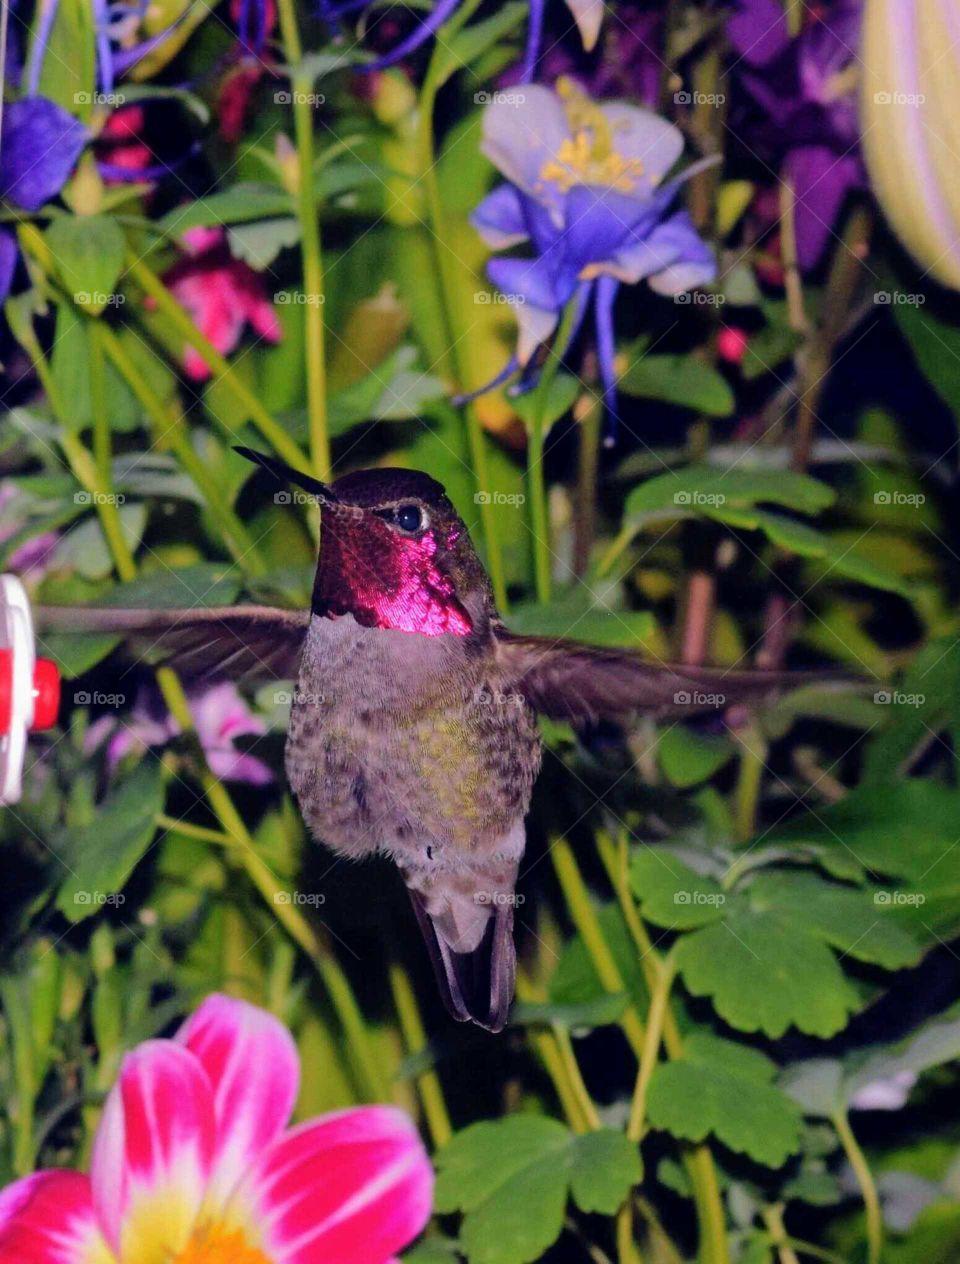 close up of a redheaded hummingbird in my backyard May 2 2018